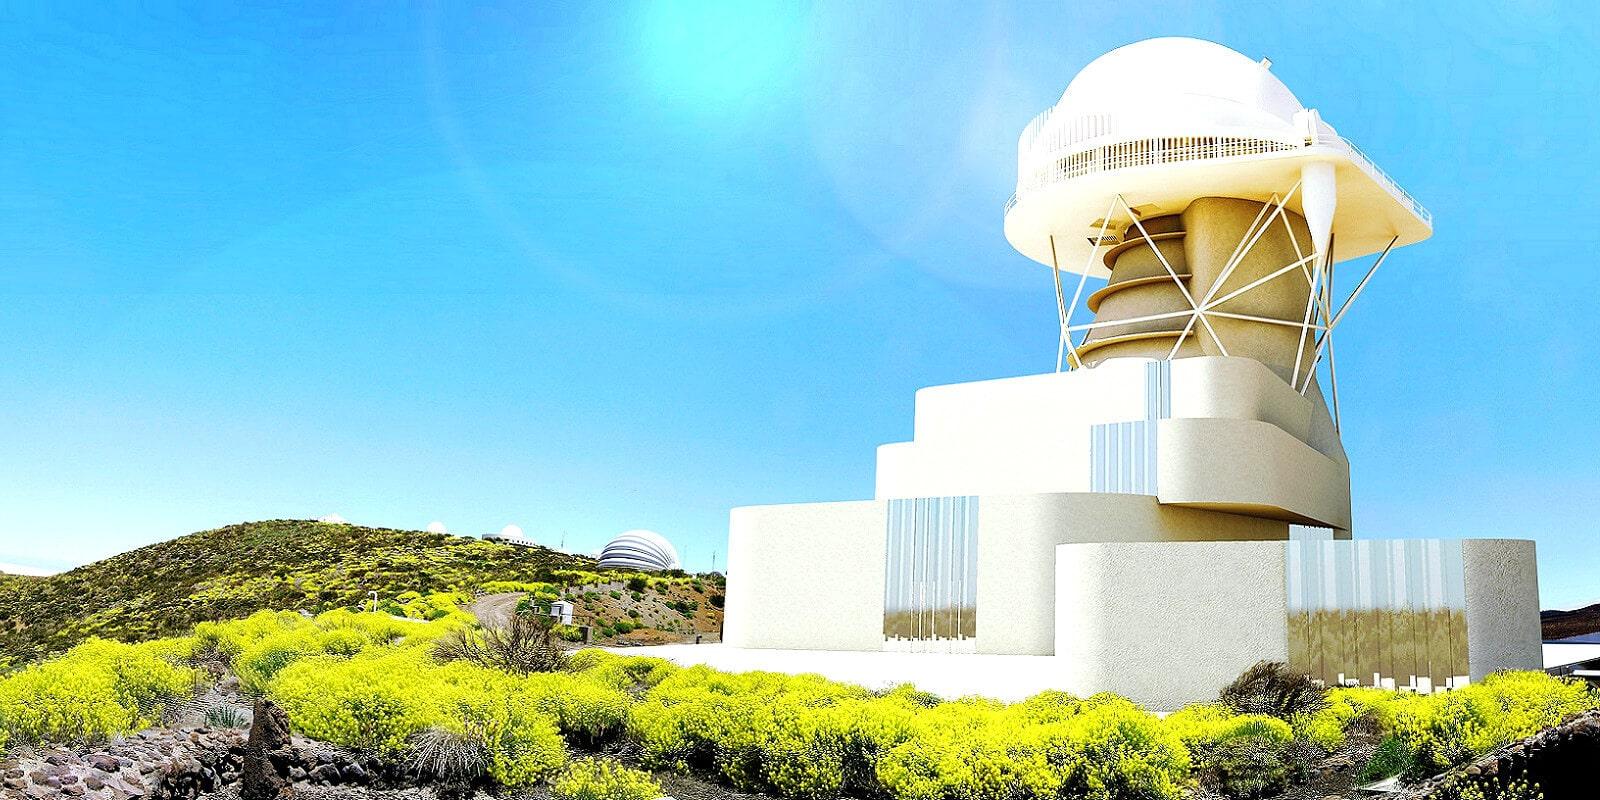 EST_European_Solar_Telescope_Canary_Islands_IDOM_ADA_3_